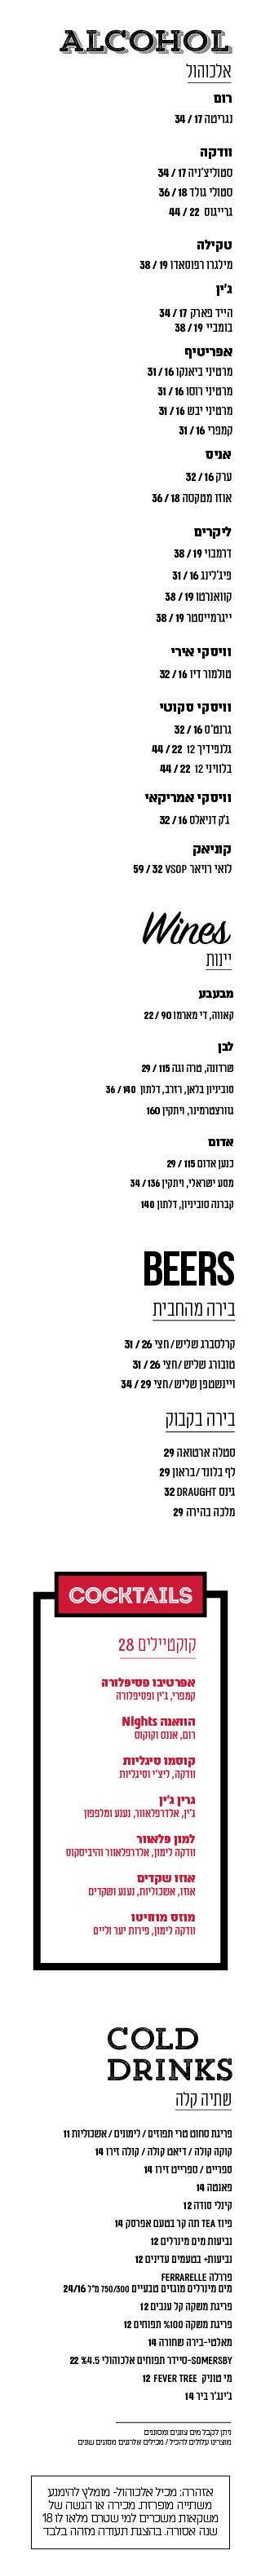 drinks - כשר